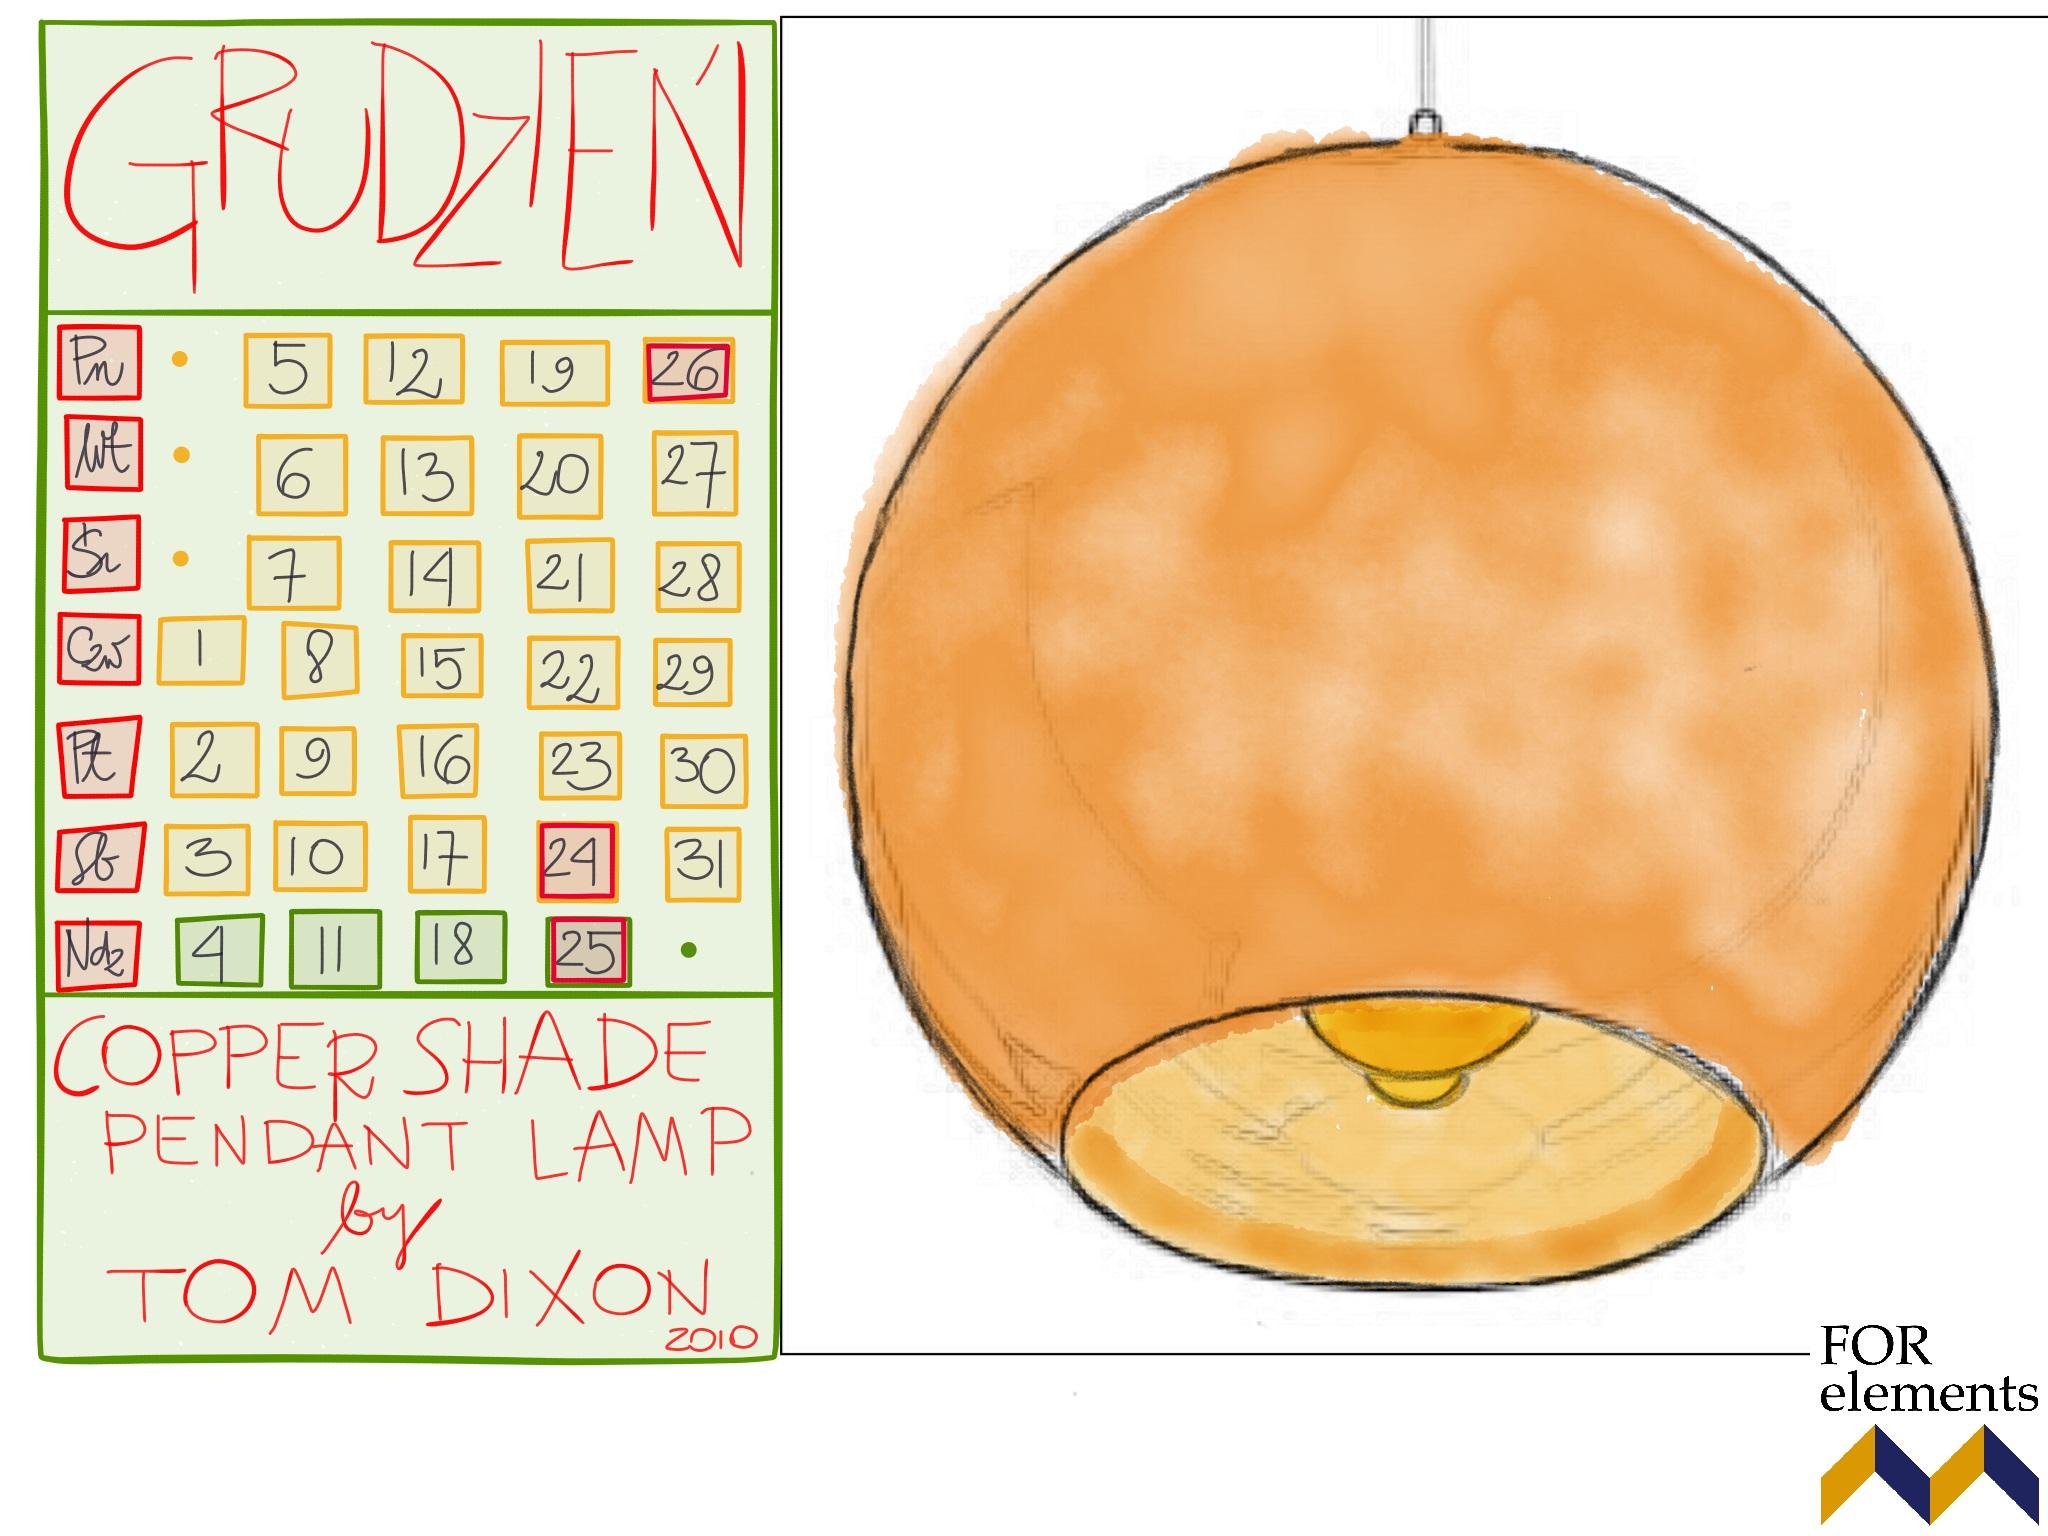 12 copper_shade_pendant_lamp_tom_dixon_calendar_2016_design_icons_furniture_interior_ideas_home_decorationg_forelements_blog